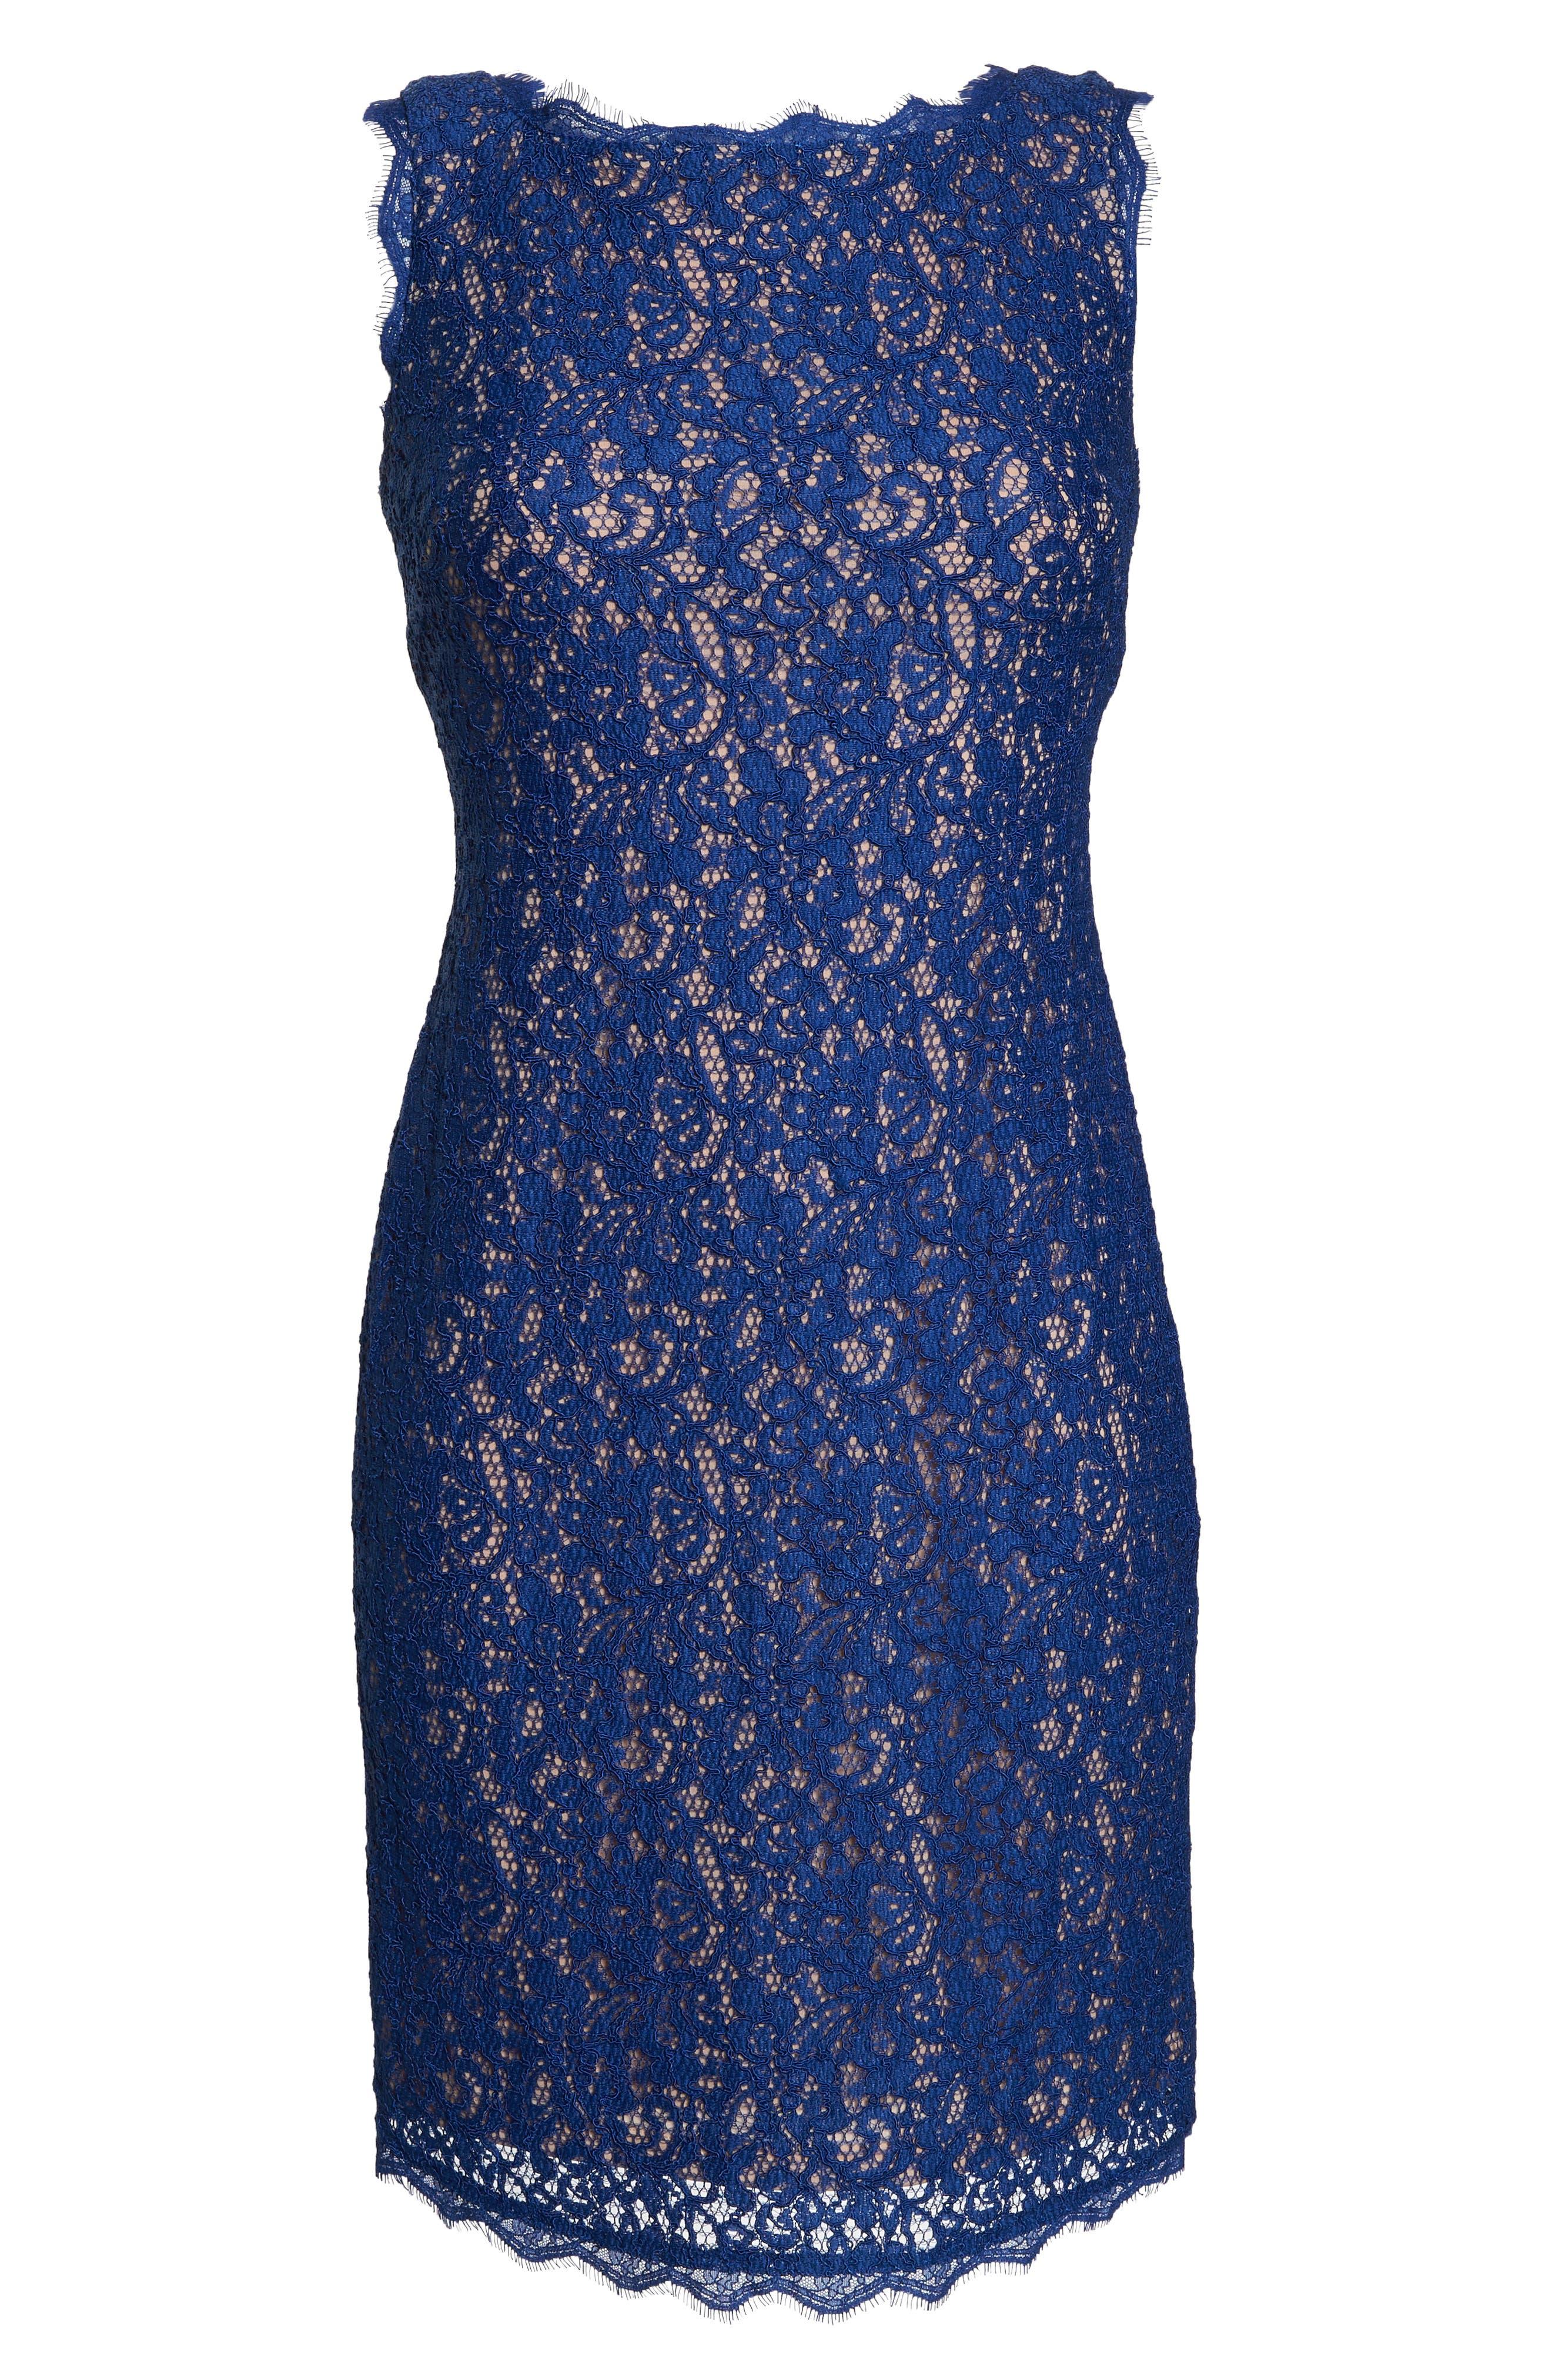 Boatneck Lace Sheath Dress,                             Alternate thumbnail 154, color,